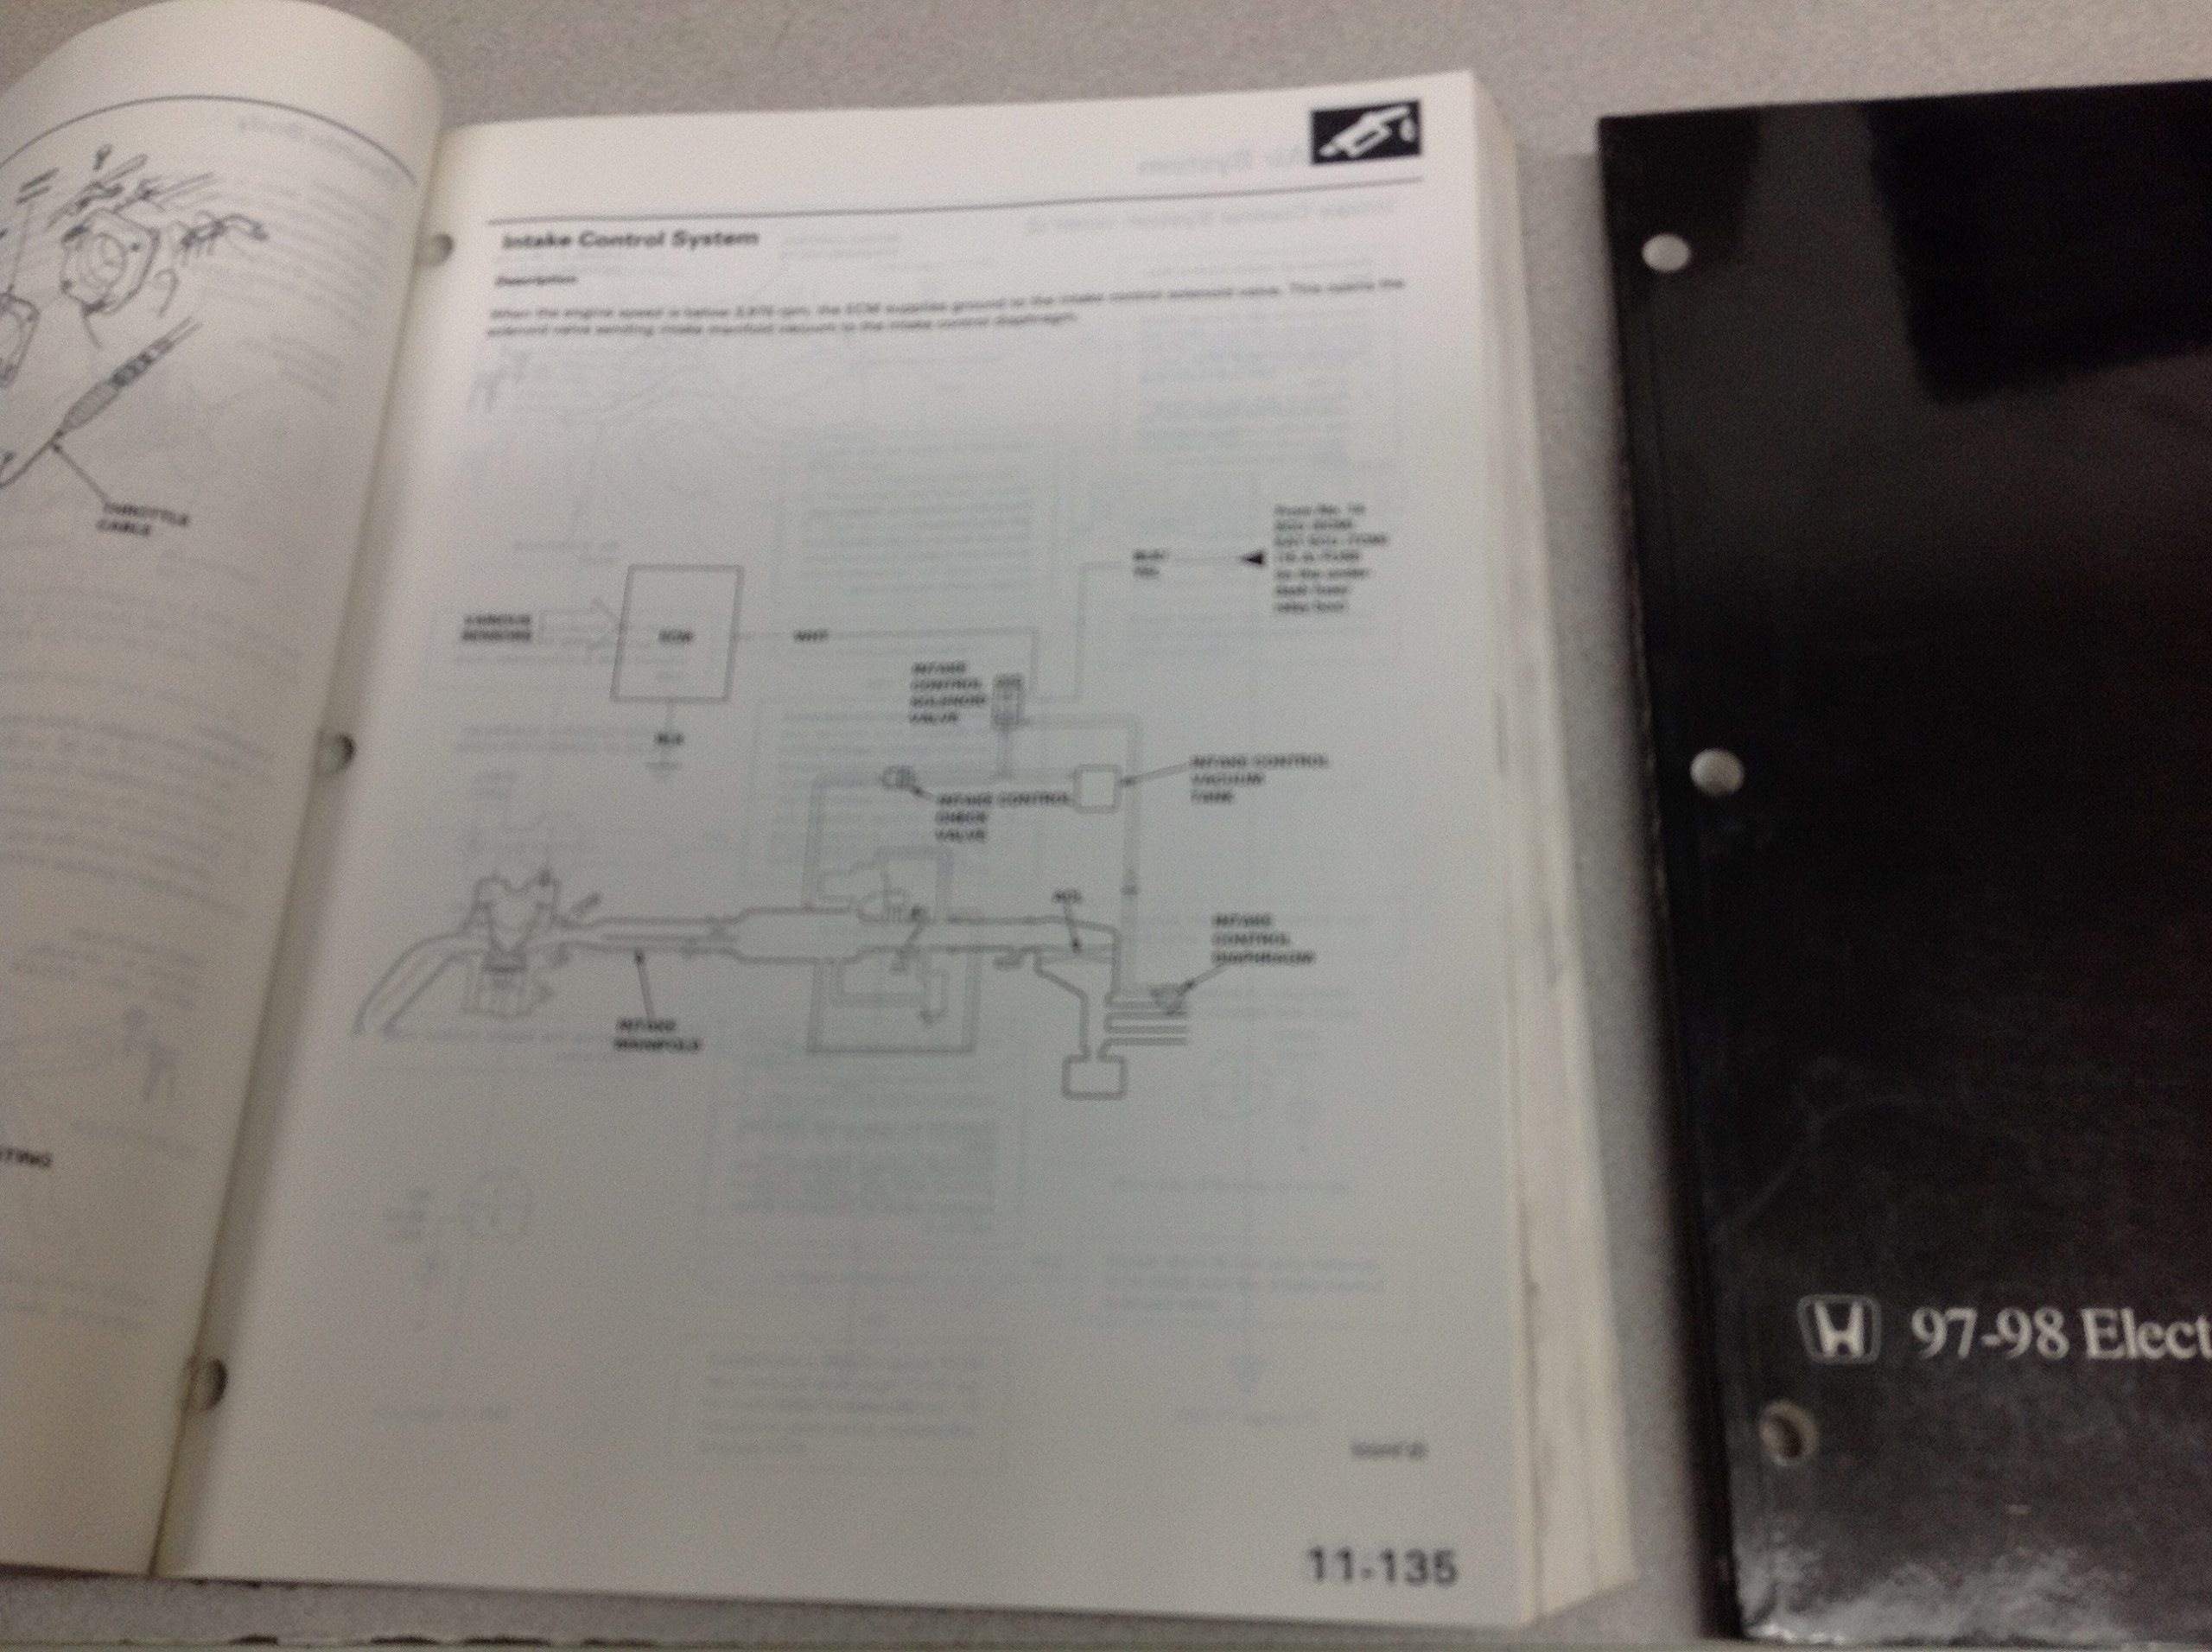 1998 Honda Prelude Service Shop Repair Manual 1997: Honda: Amazon.com: Books